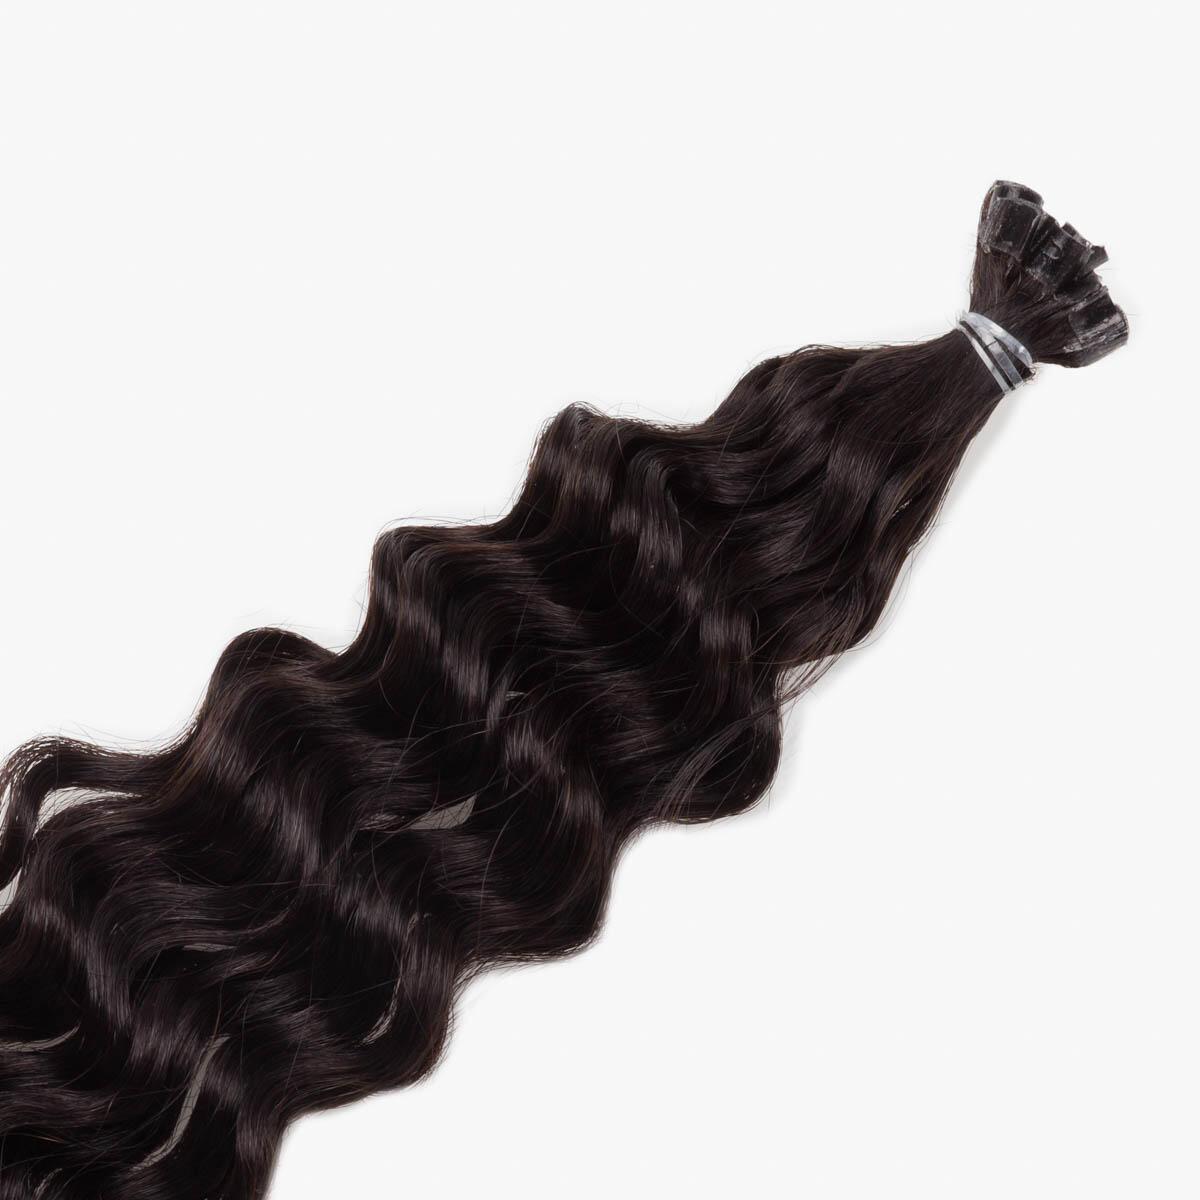 Nail Hair Original Curly 1.2 Black Brown 40 cm